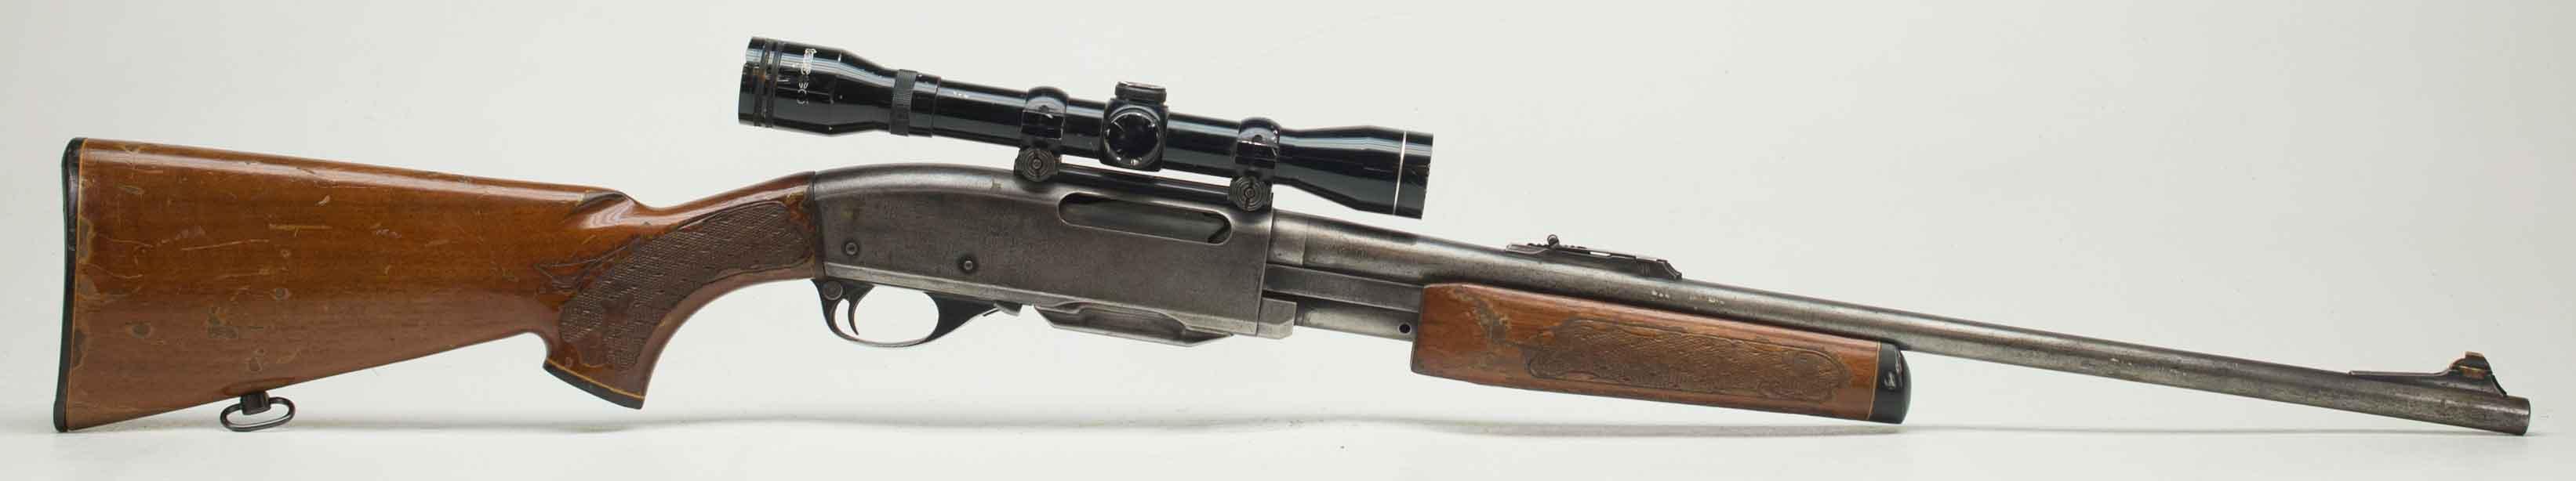 Remington 760 gamemaster replacement stocks  Remington® 760